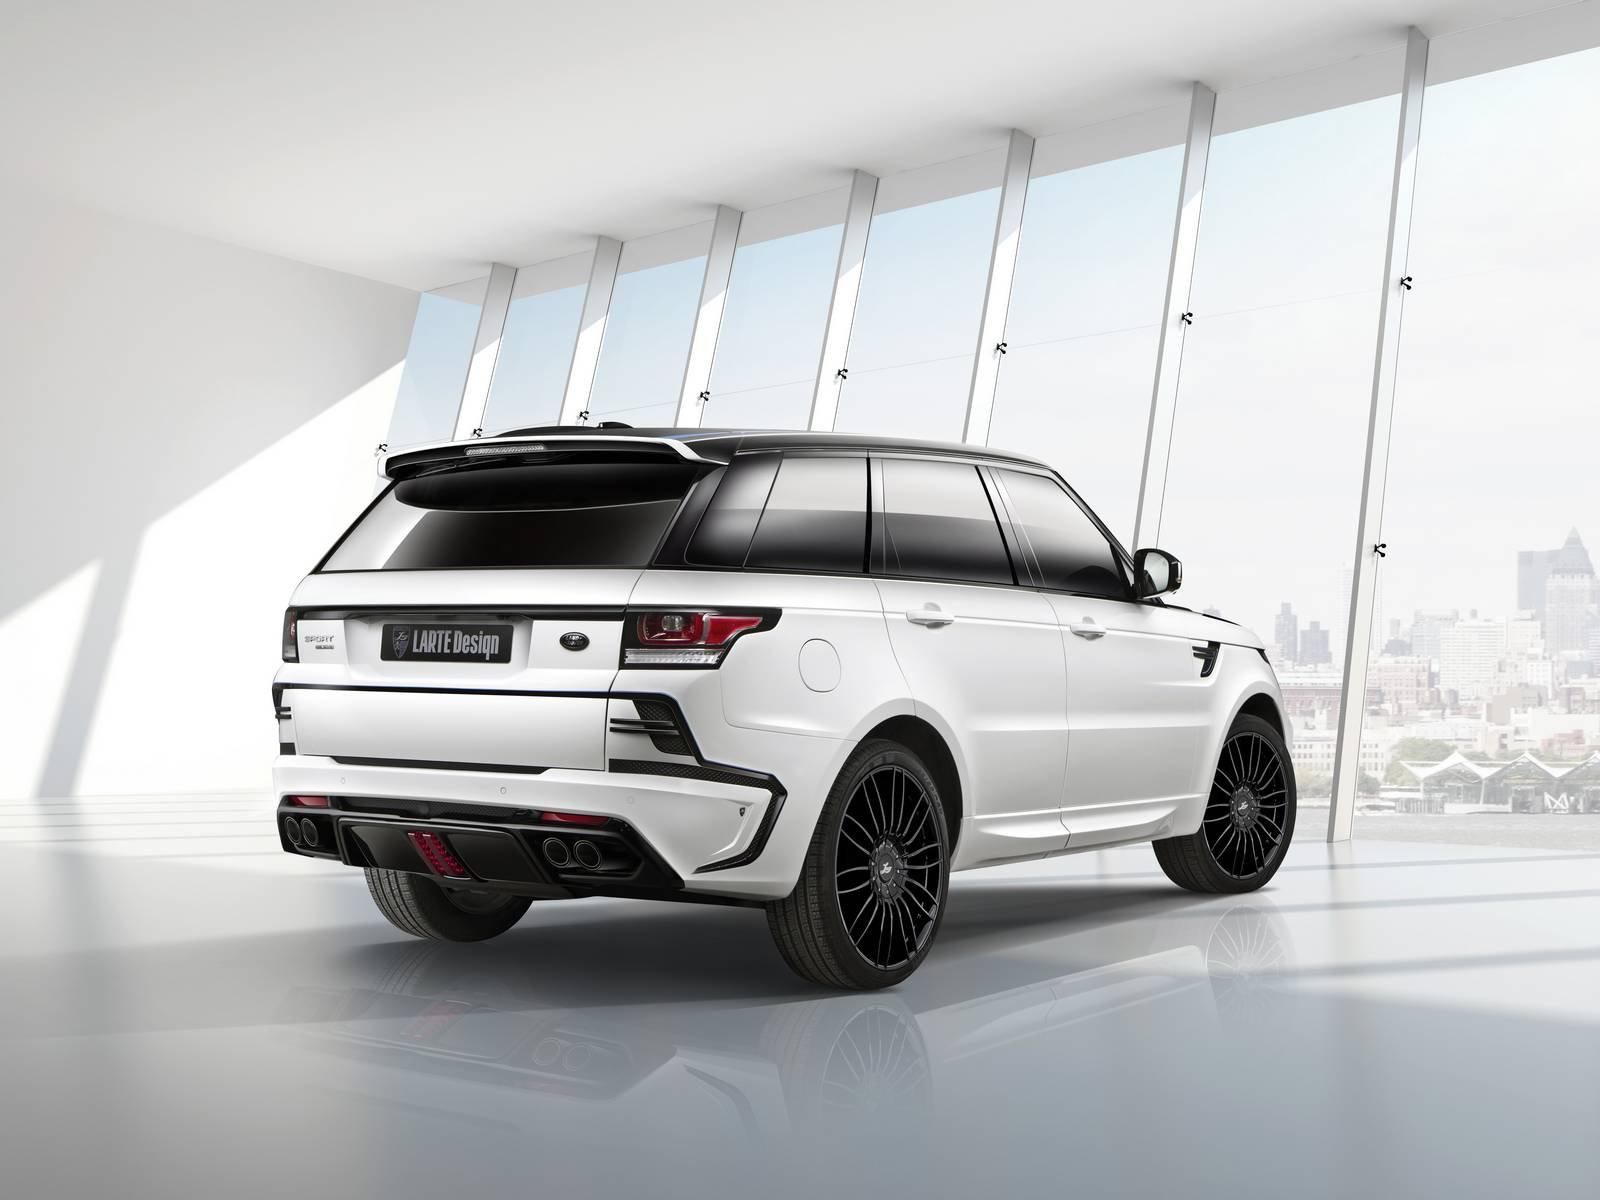 http://www.gtspirit.com/wp-content/gallery/larte-design-range-rover-sport/larte-design-range-rover-sport-5.jpg